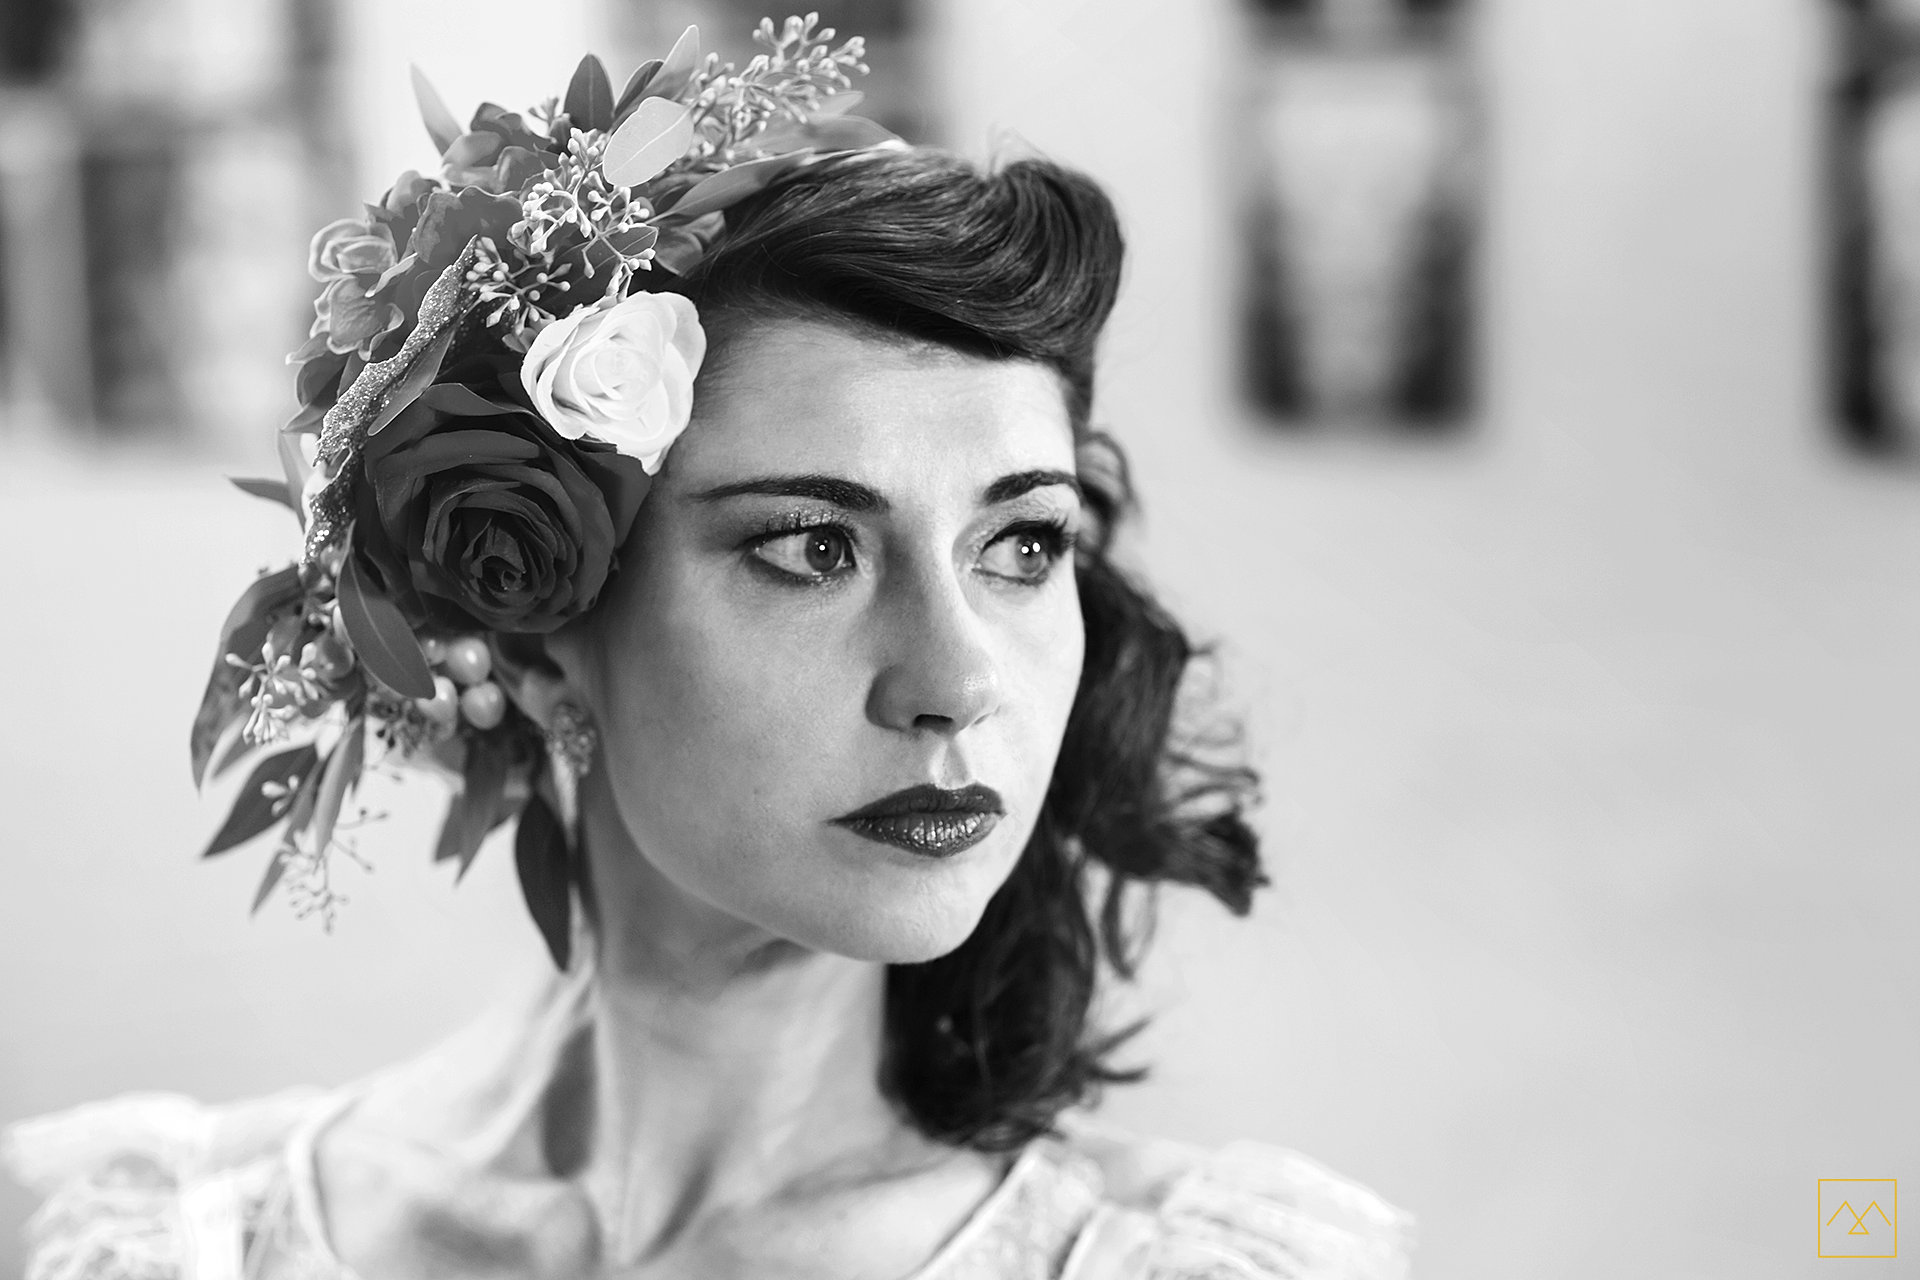 maquillage coiffure lyon 16 anna cruz maquillage et coiffure mariage lyon shooting inspiration collection 2017 - Coiffeuse Maquilleuse Mariage Lyon